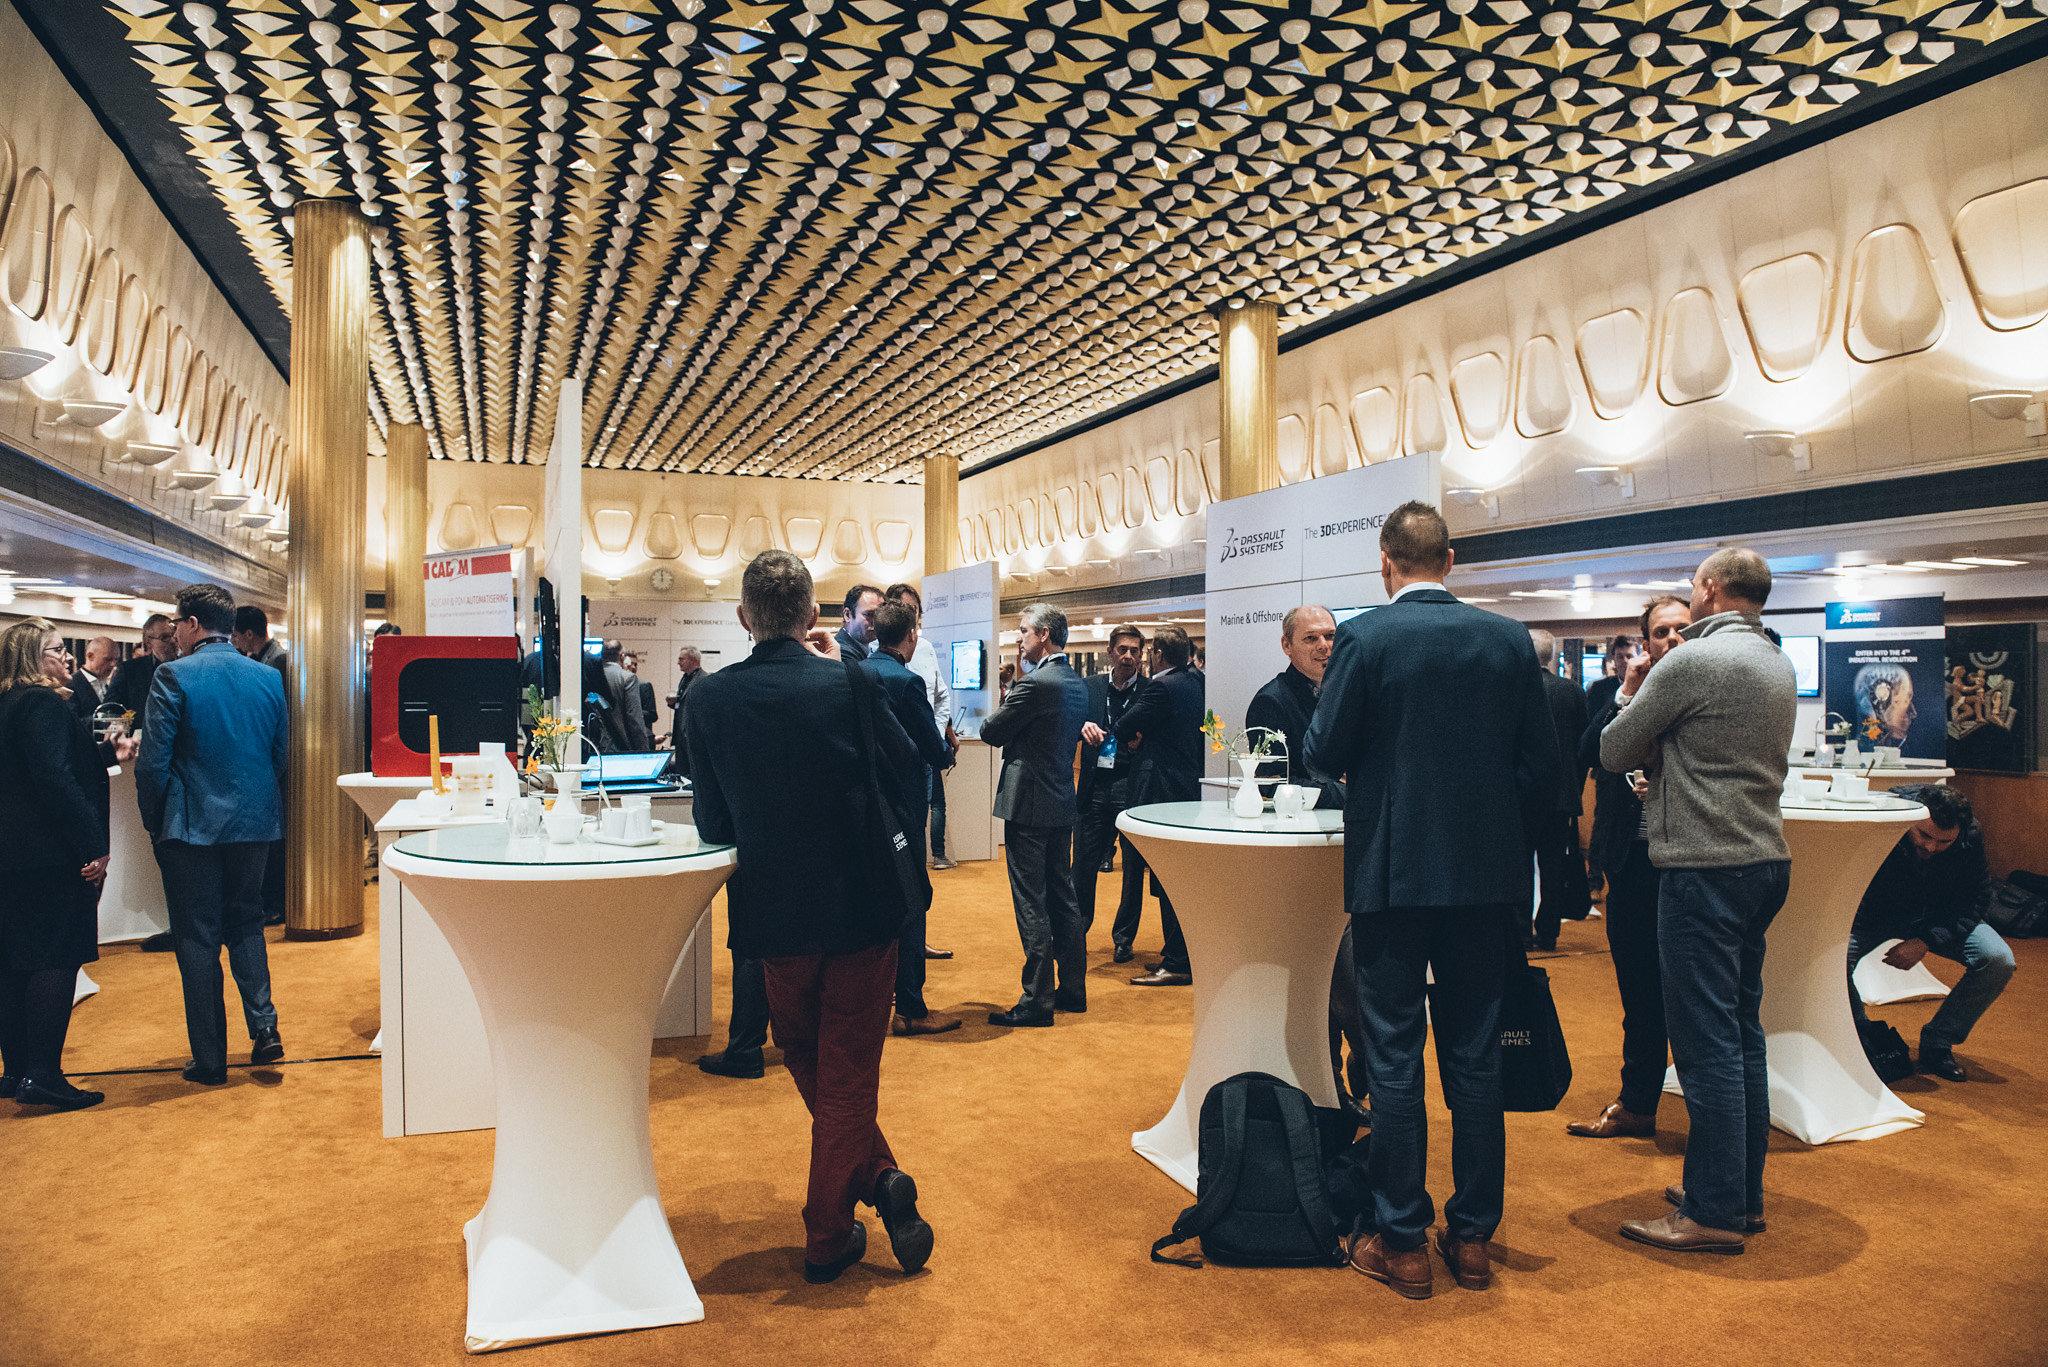 3DX_forum_event_highlights_rotterdam_networking-32.jpg